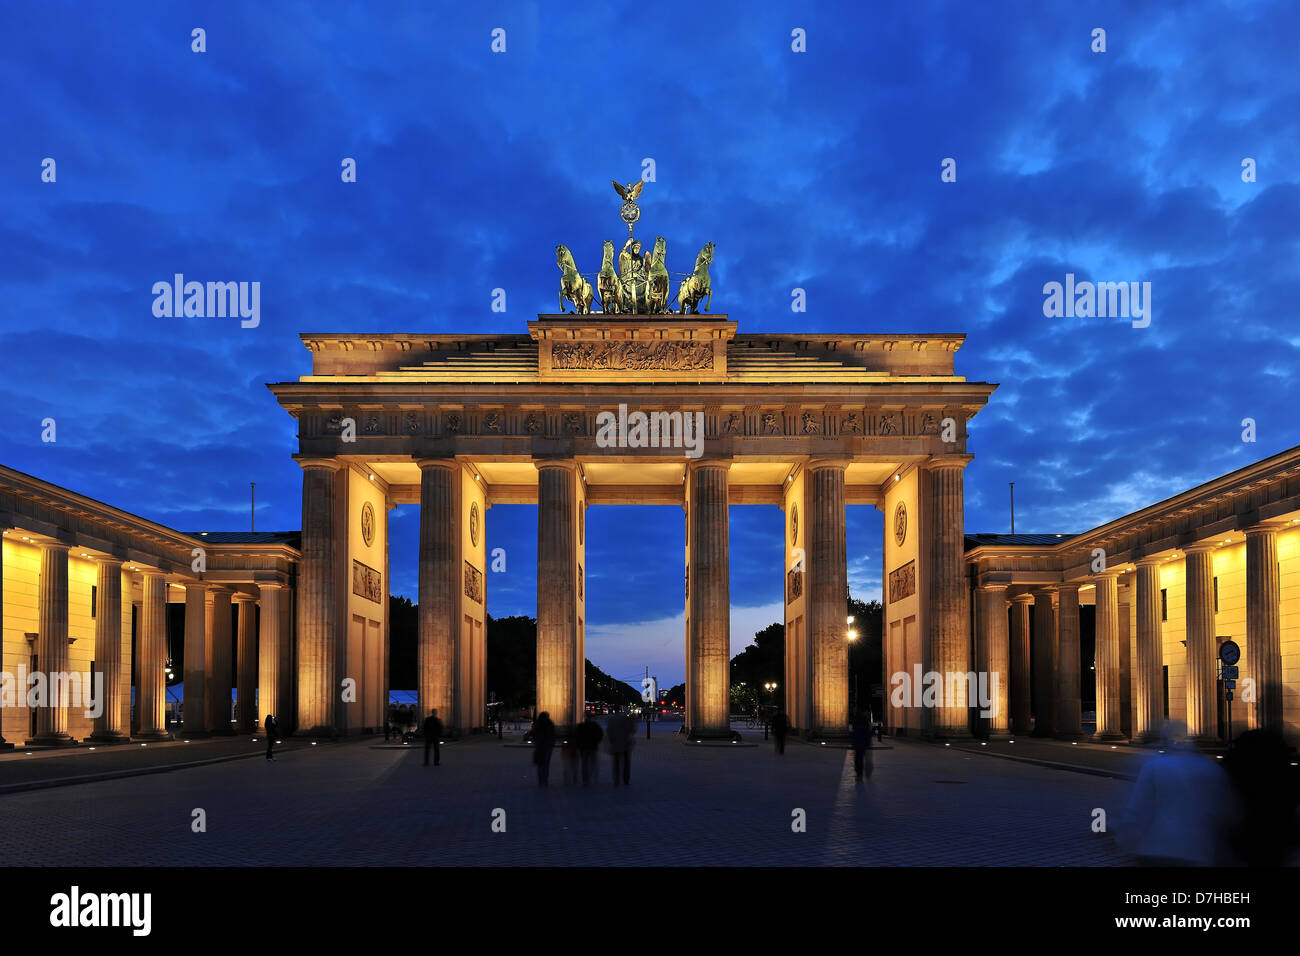 The Brandenburg Gate in Berlin at night - Stock Image